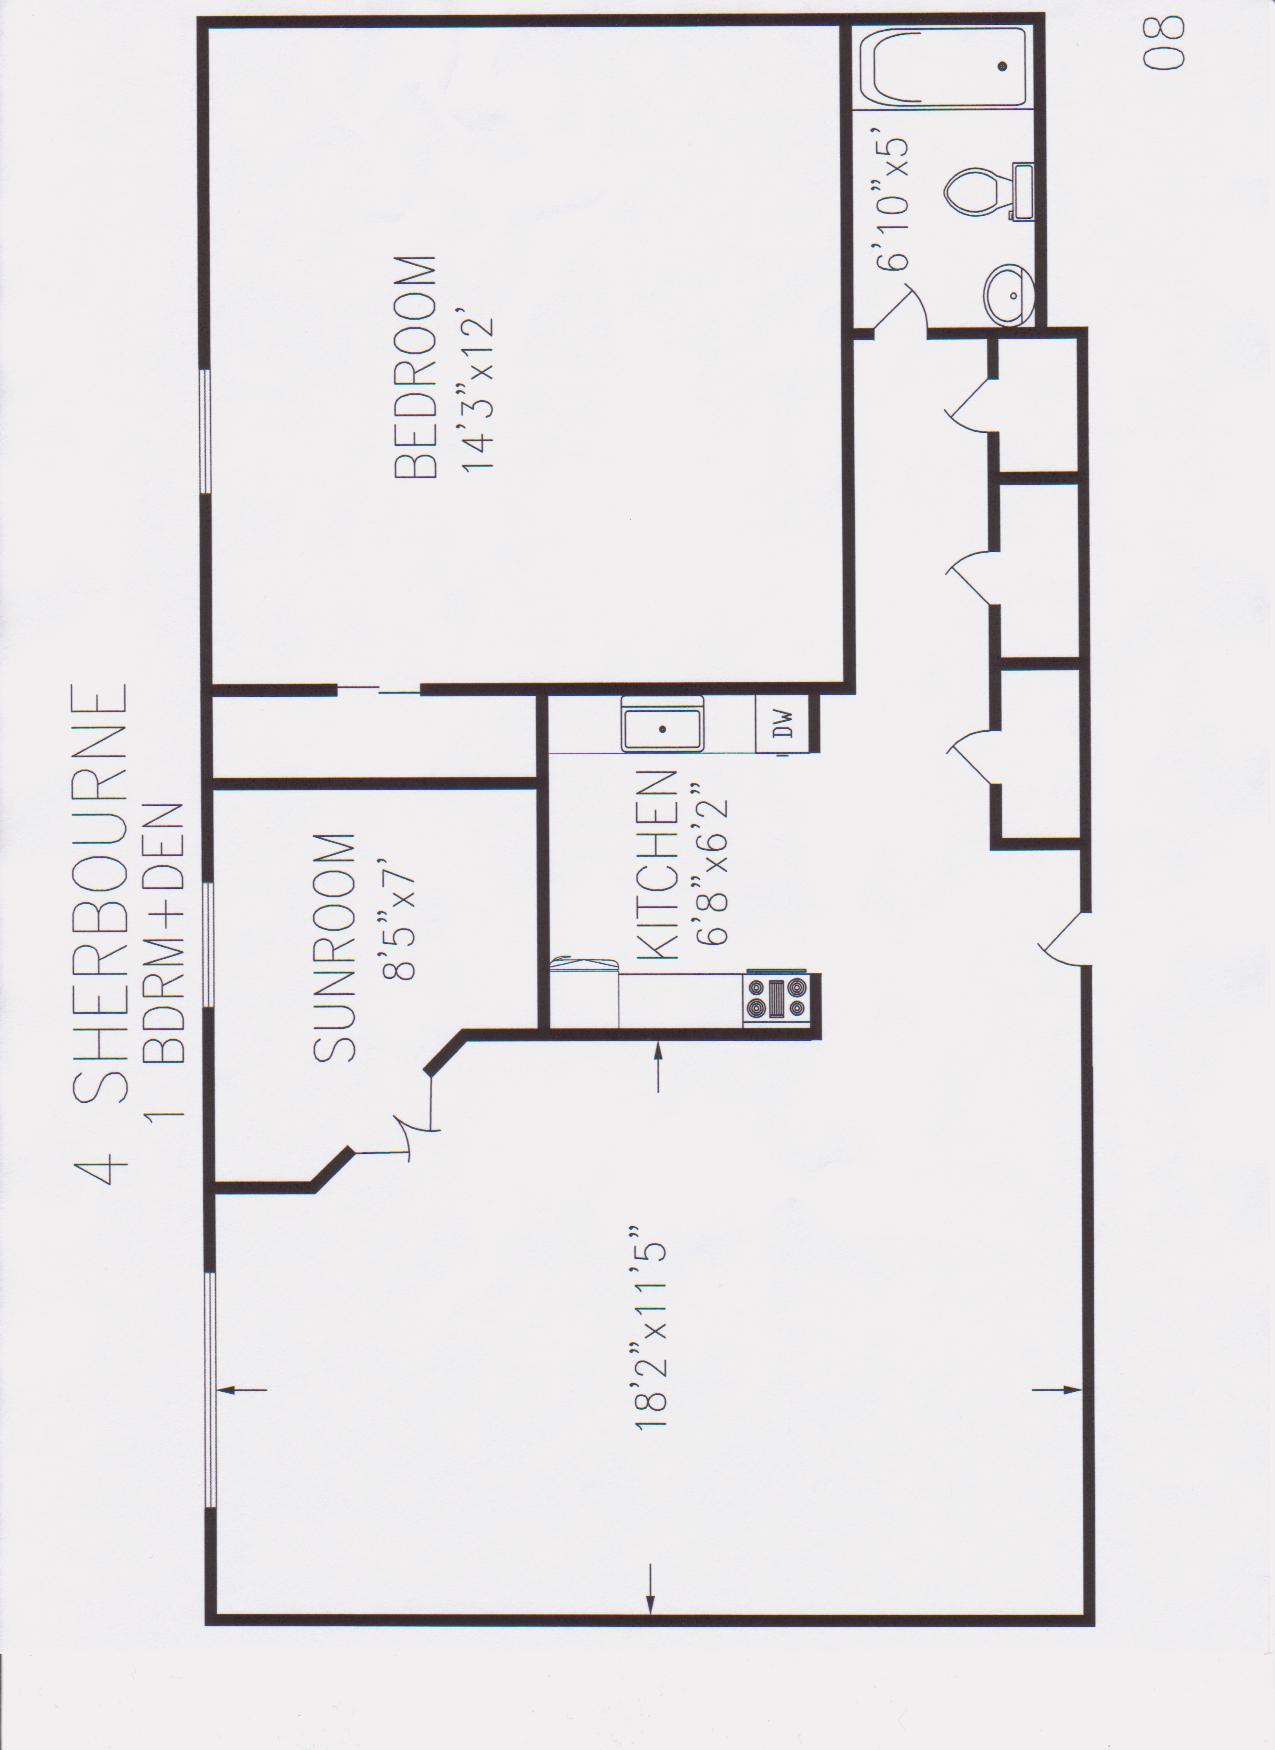 4 Sherbourne St. North « Mercedes Homes Inc